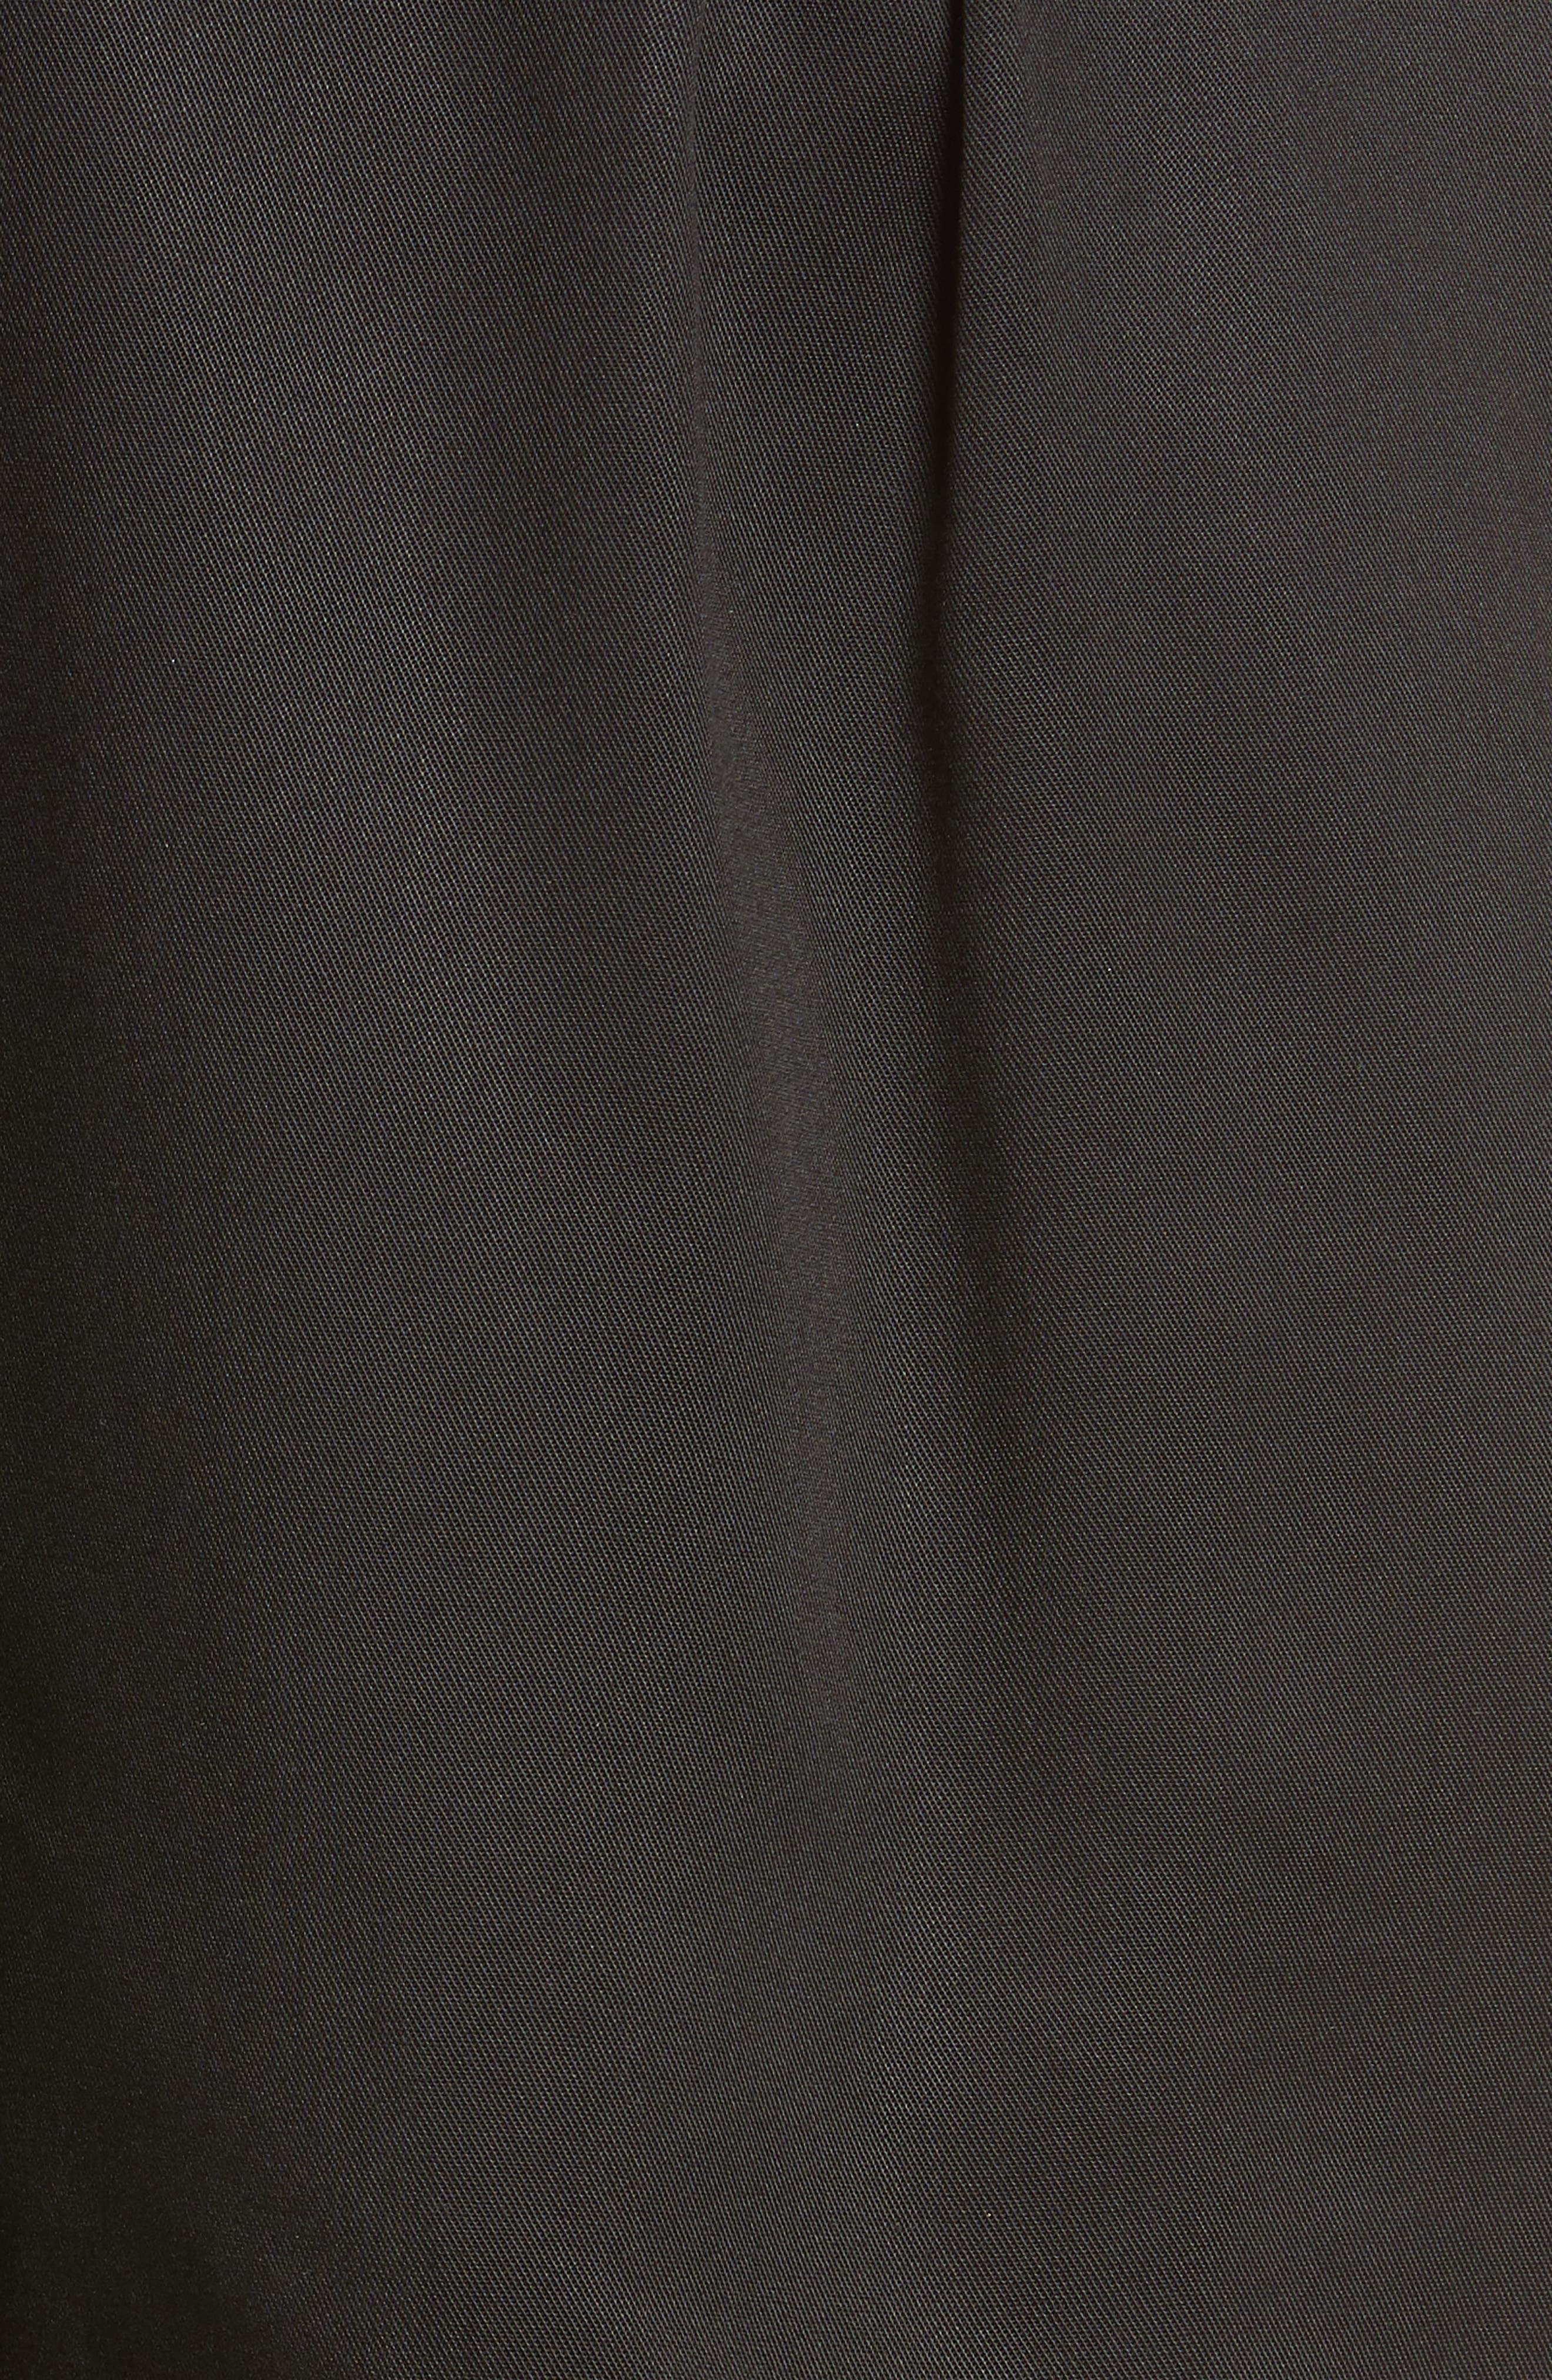 D-Ring Belted Shorts,                             Alternate thumbnail 5, color,                             BLACK